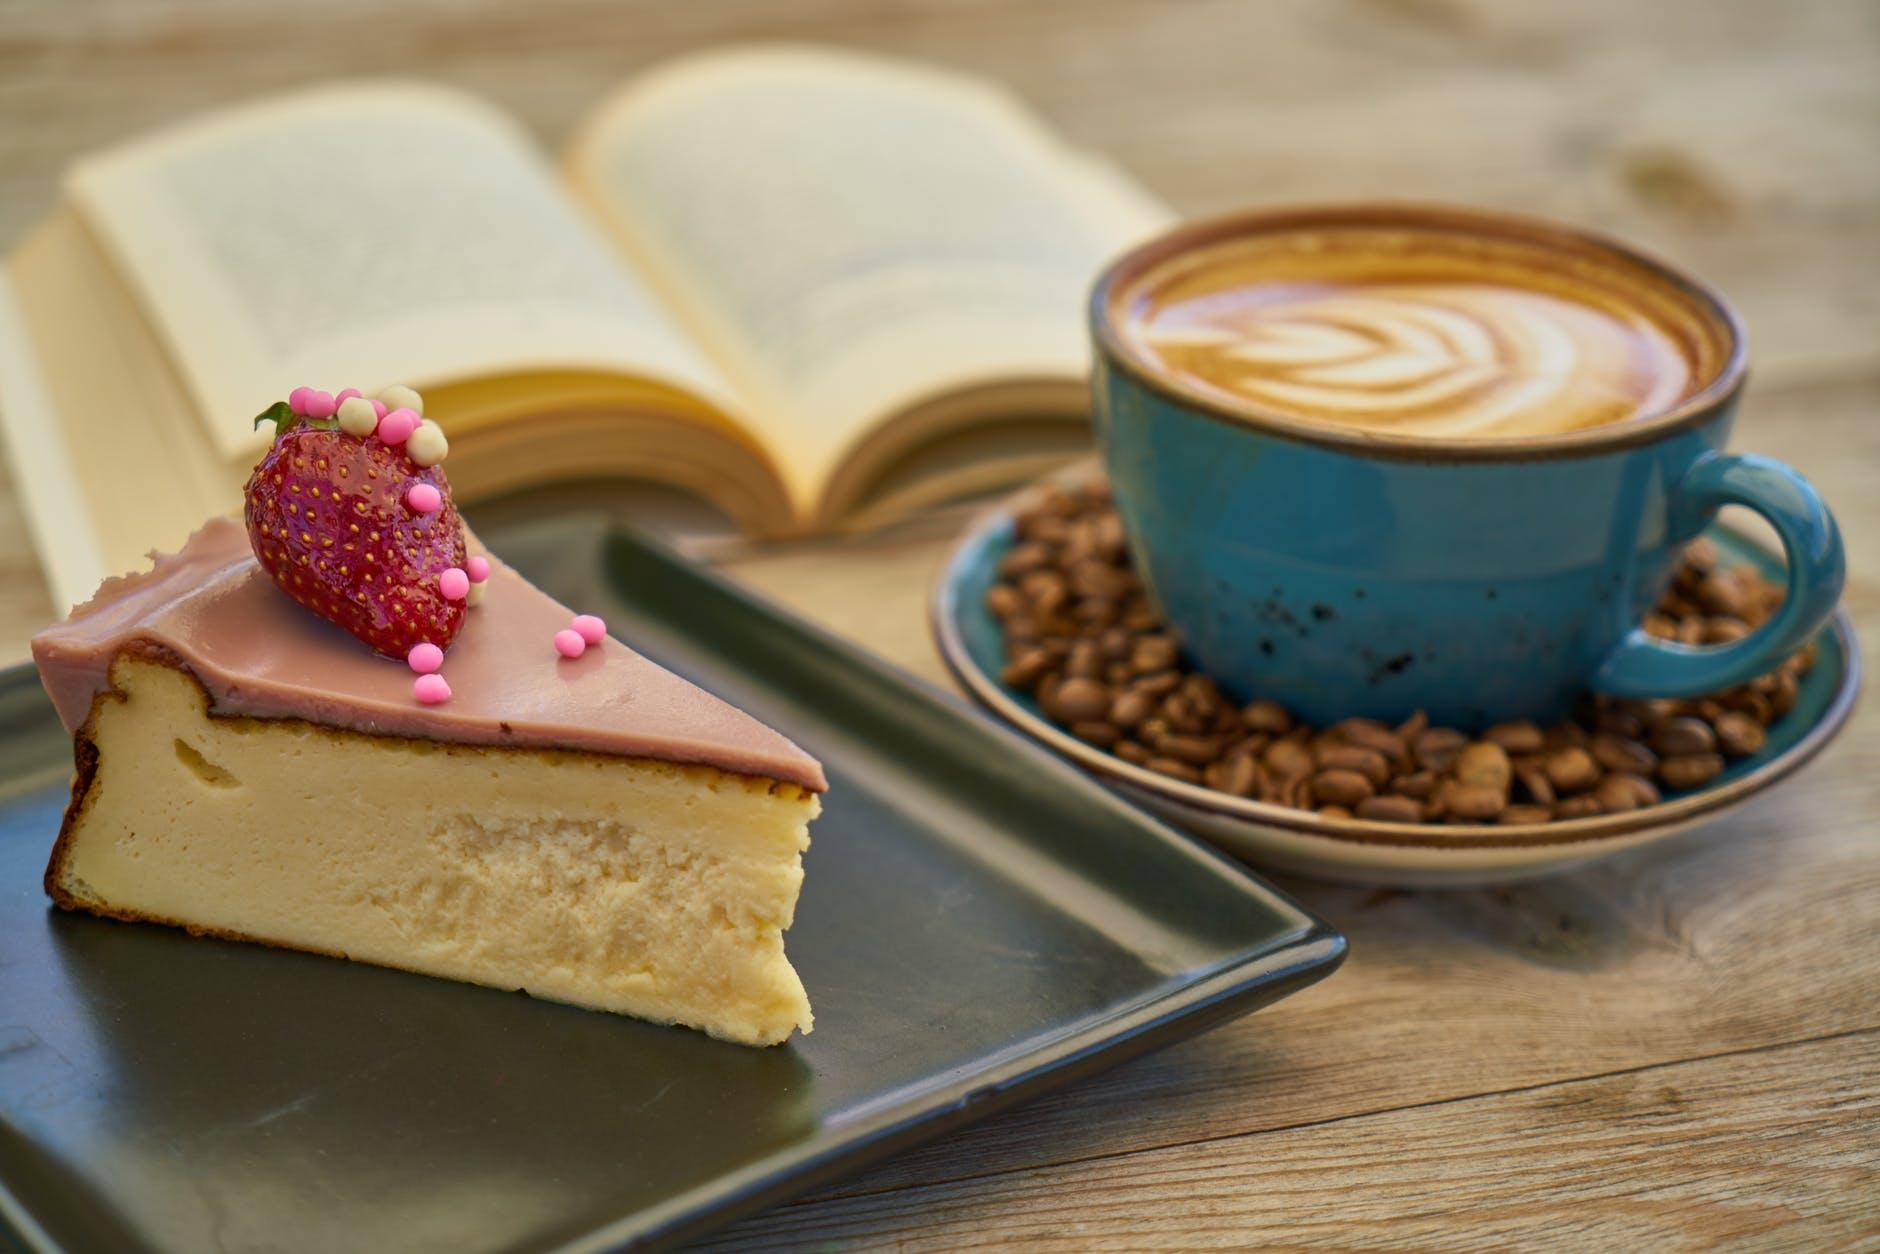 kraft cheesecake recipe, RECIPES WELLNESS